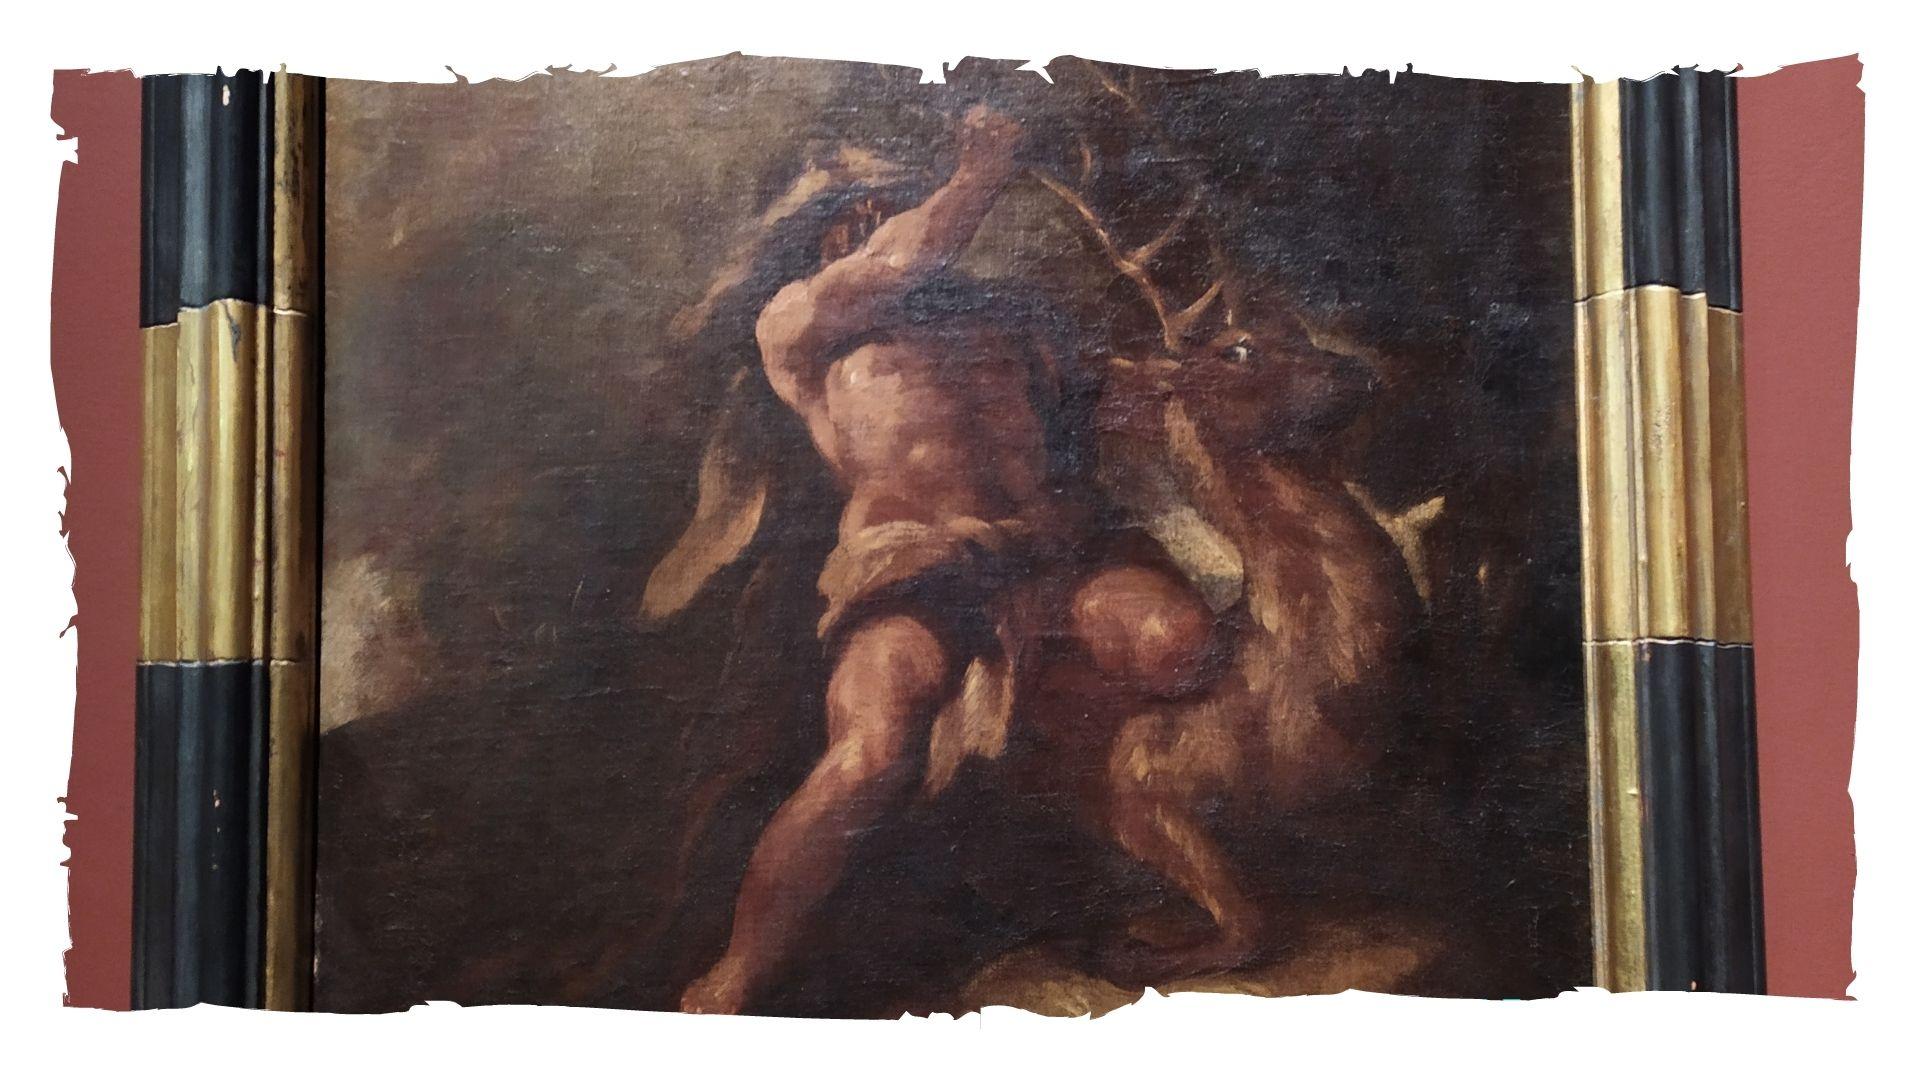 Luca Giordano a Capodimonte